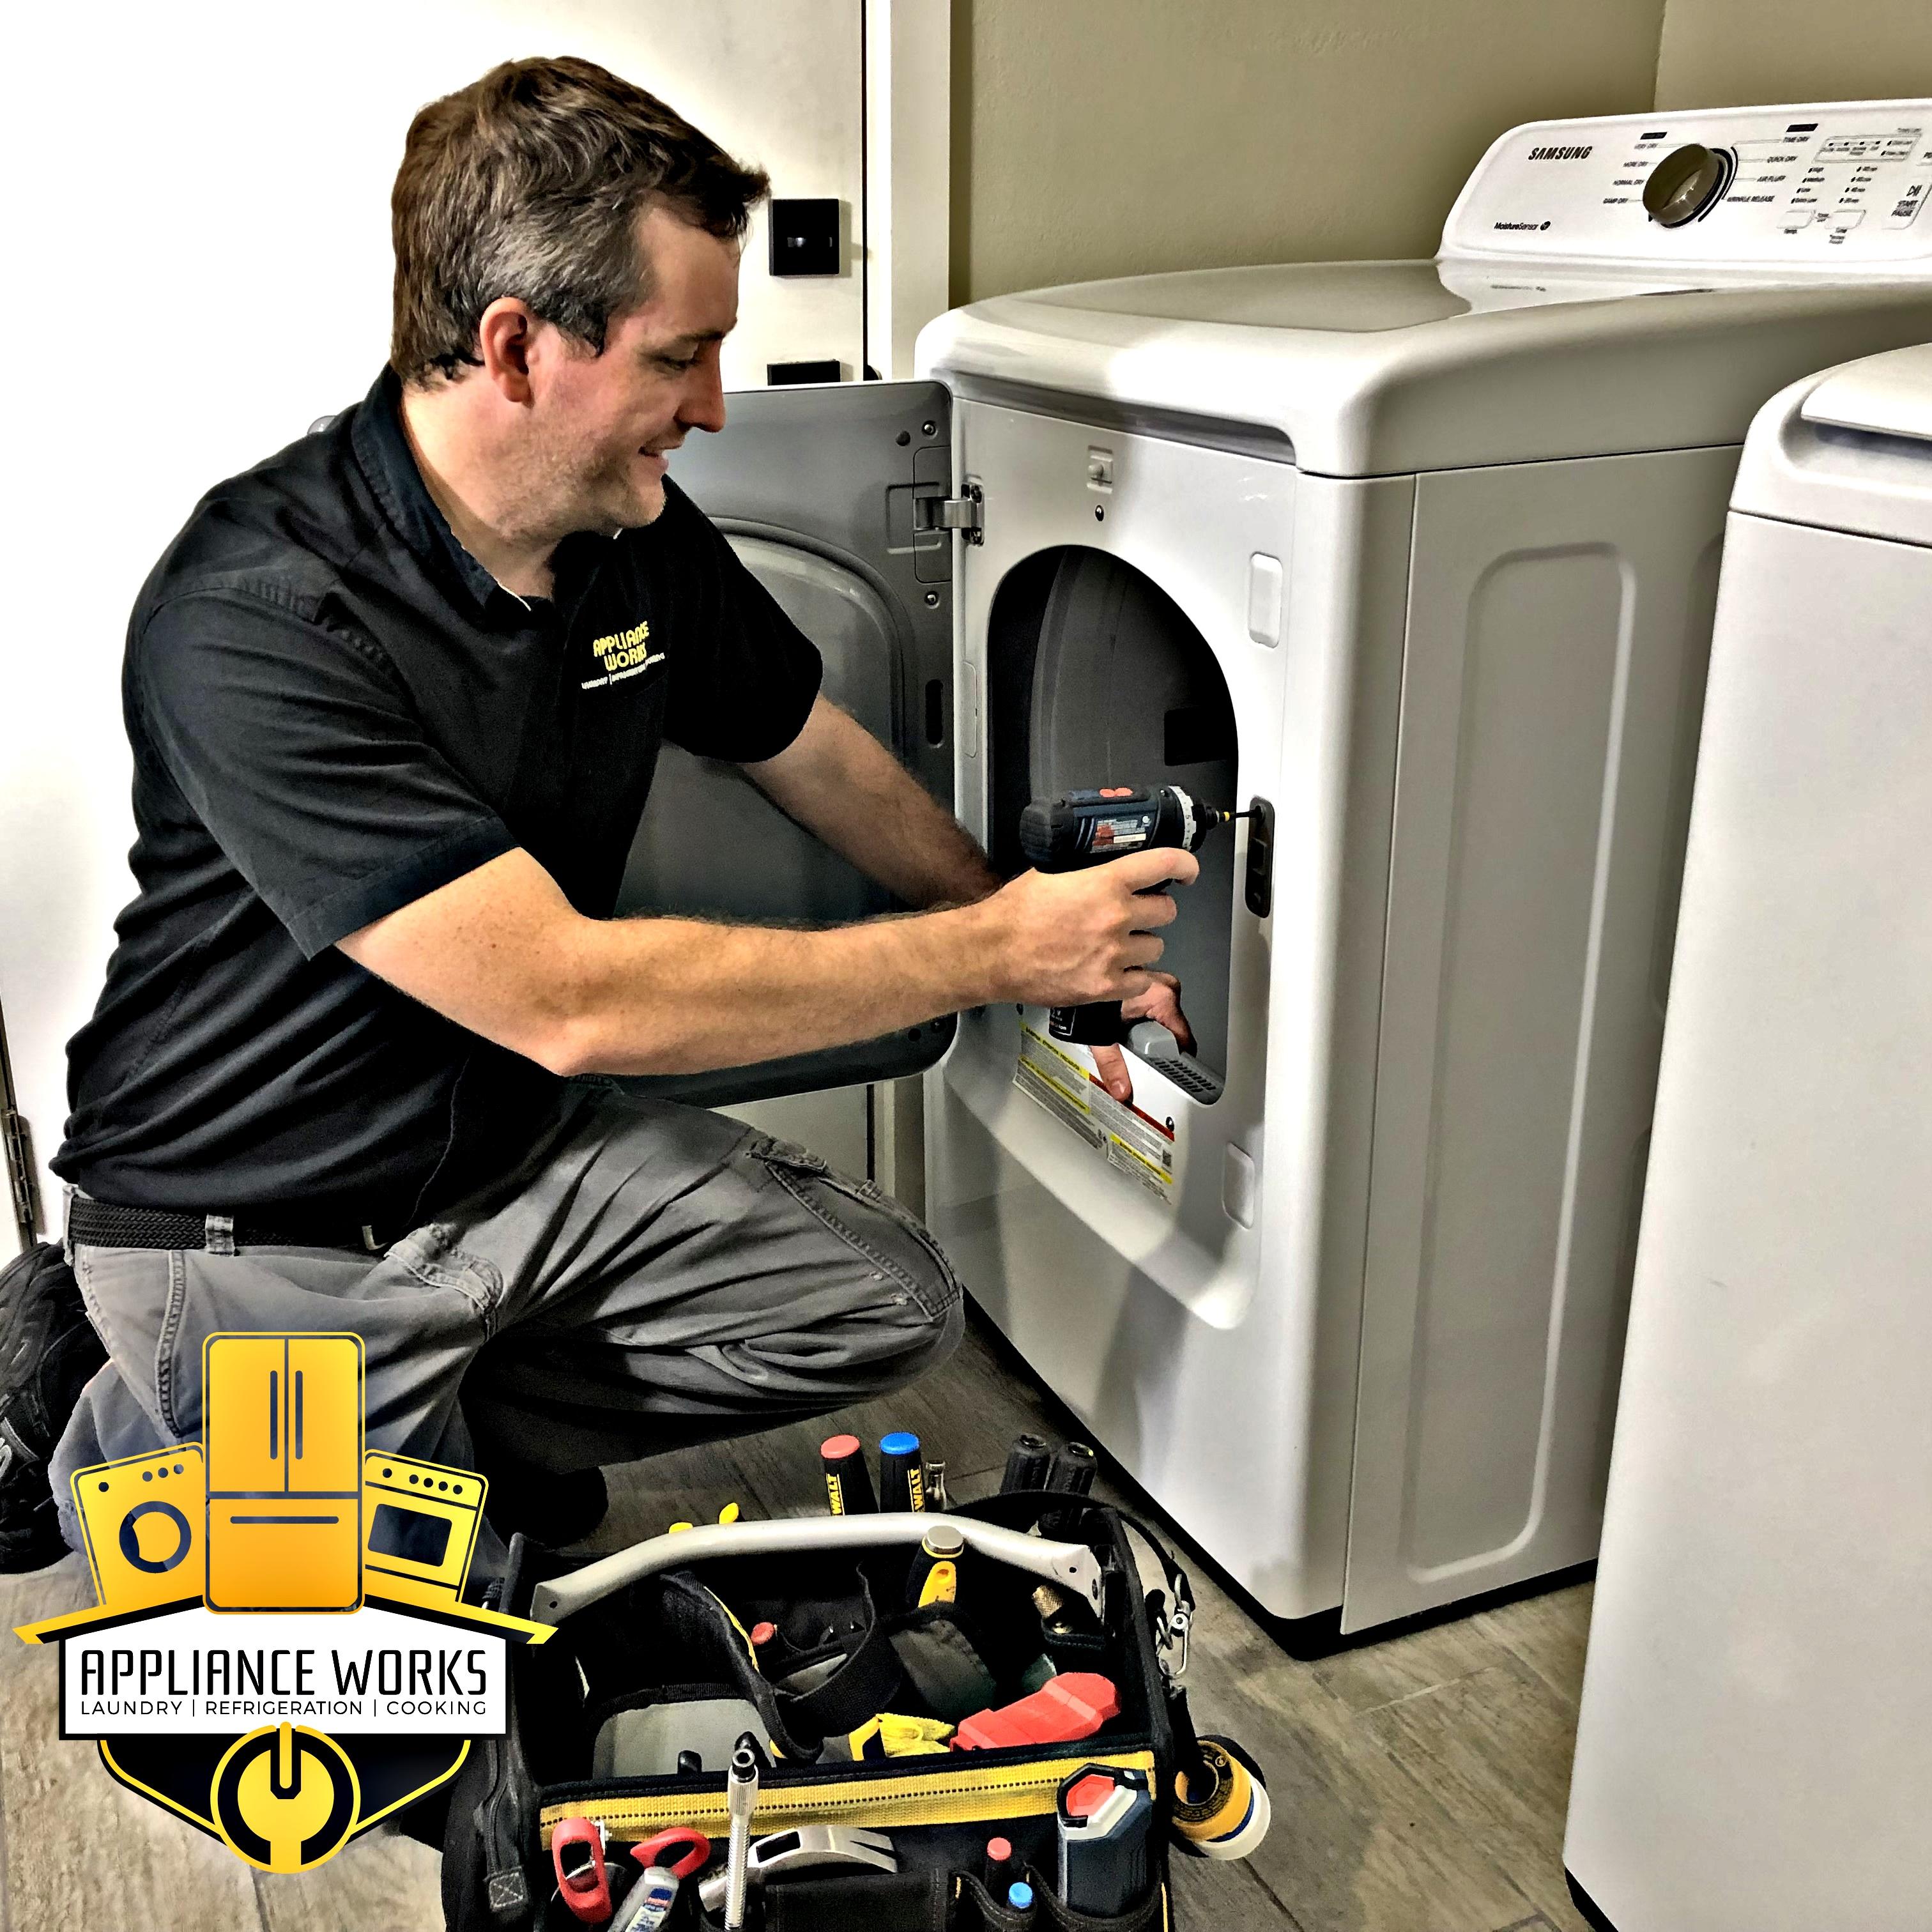 https://applianceworksaz.com/wp-content/uploads/2019/10/Dryer-Listing-HDR-Photo.jpg